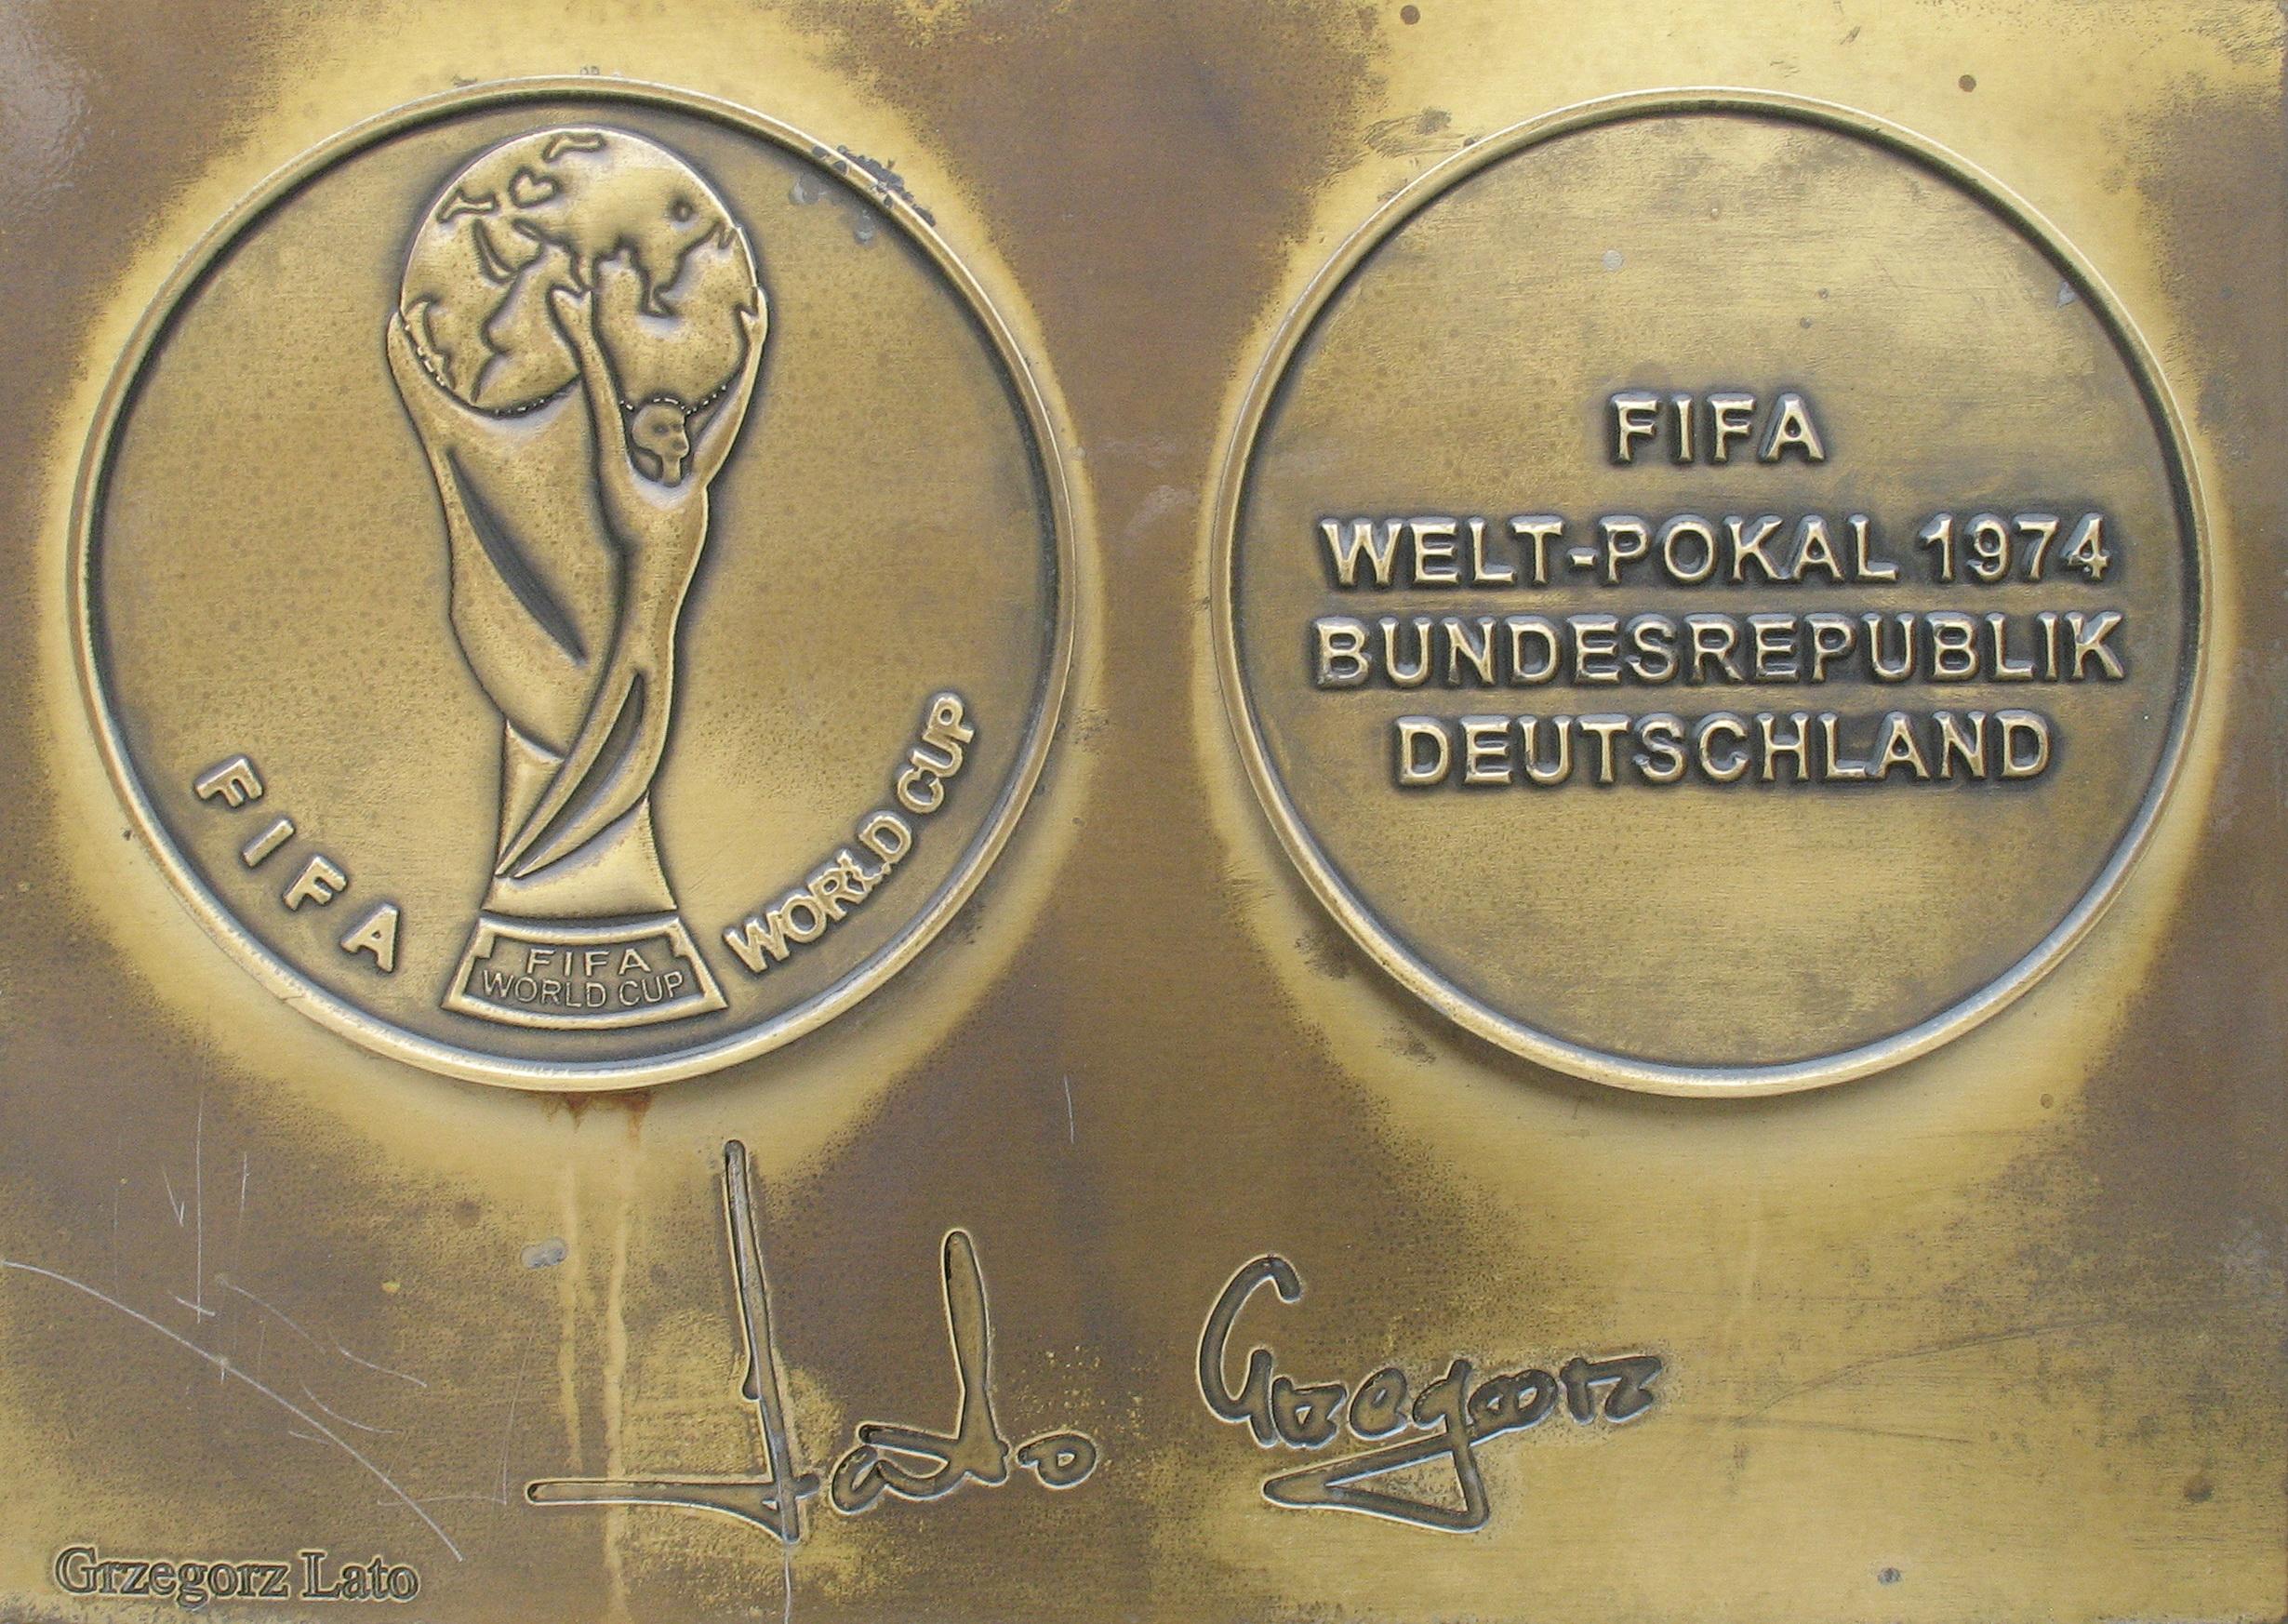 File Grzegorz Lato medal & autograph Wikimedia mons